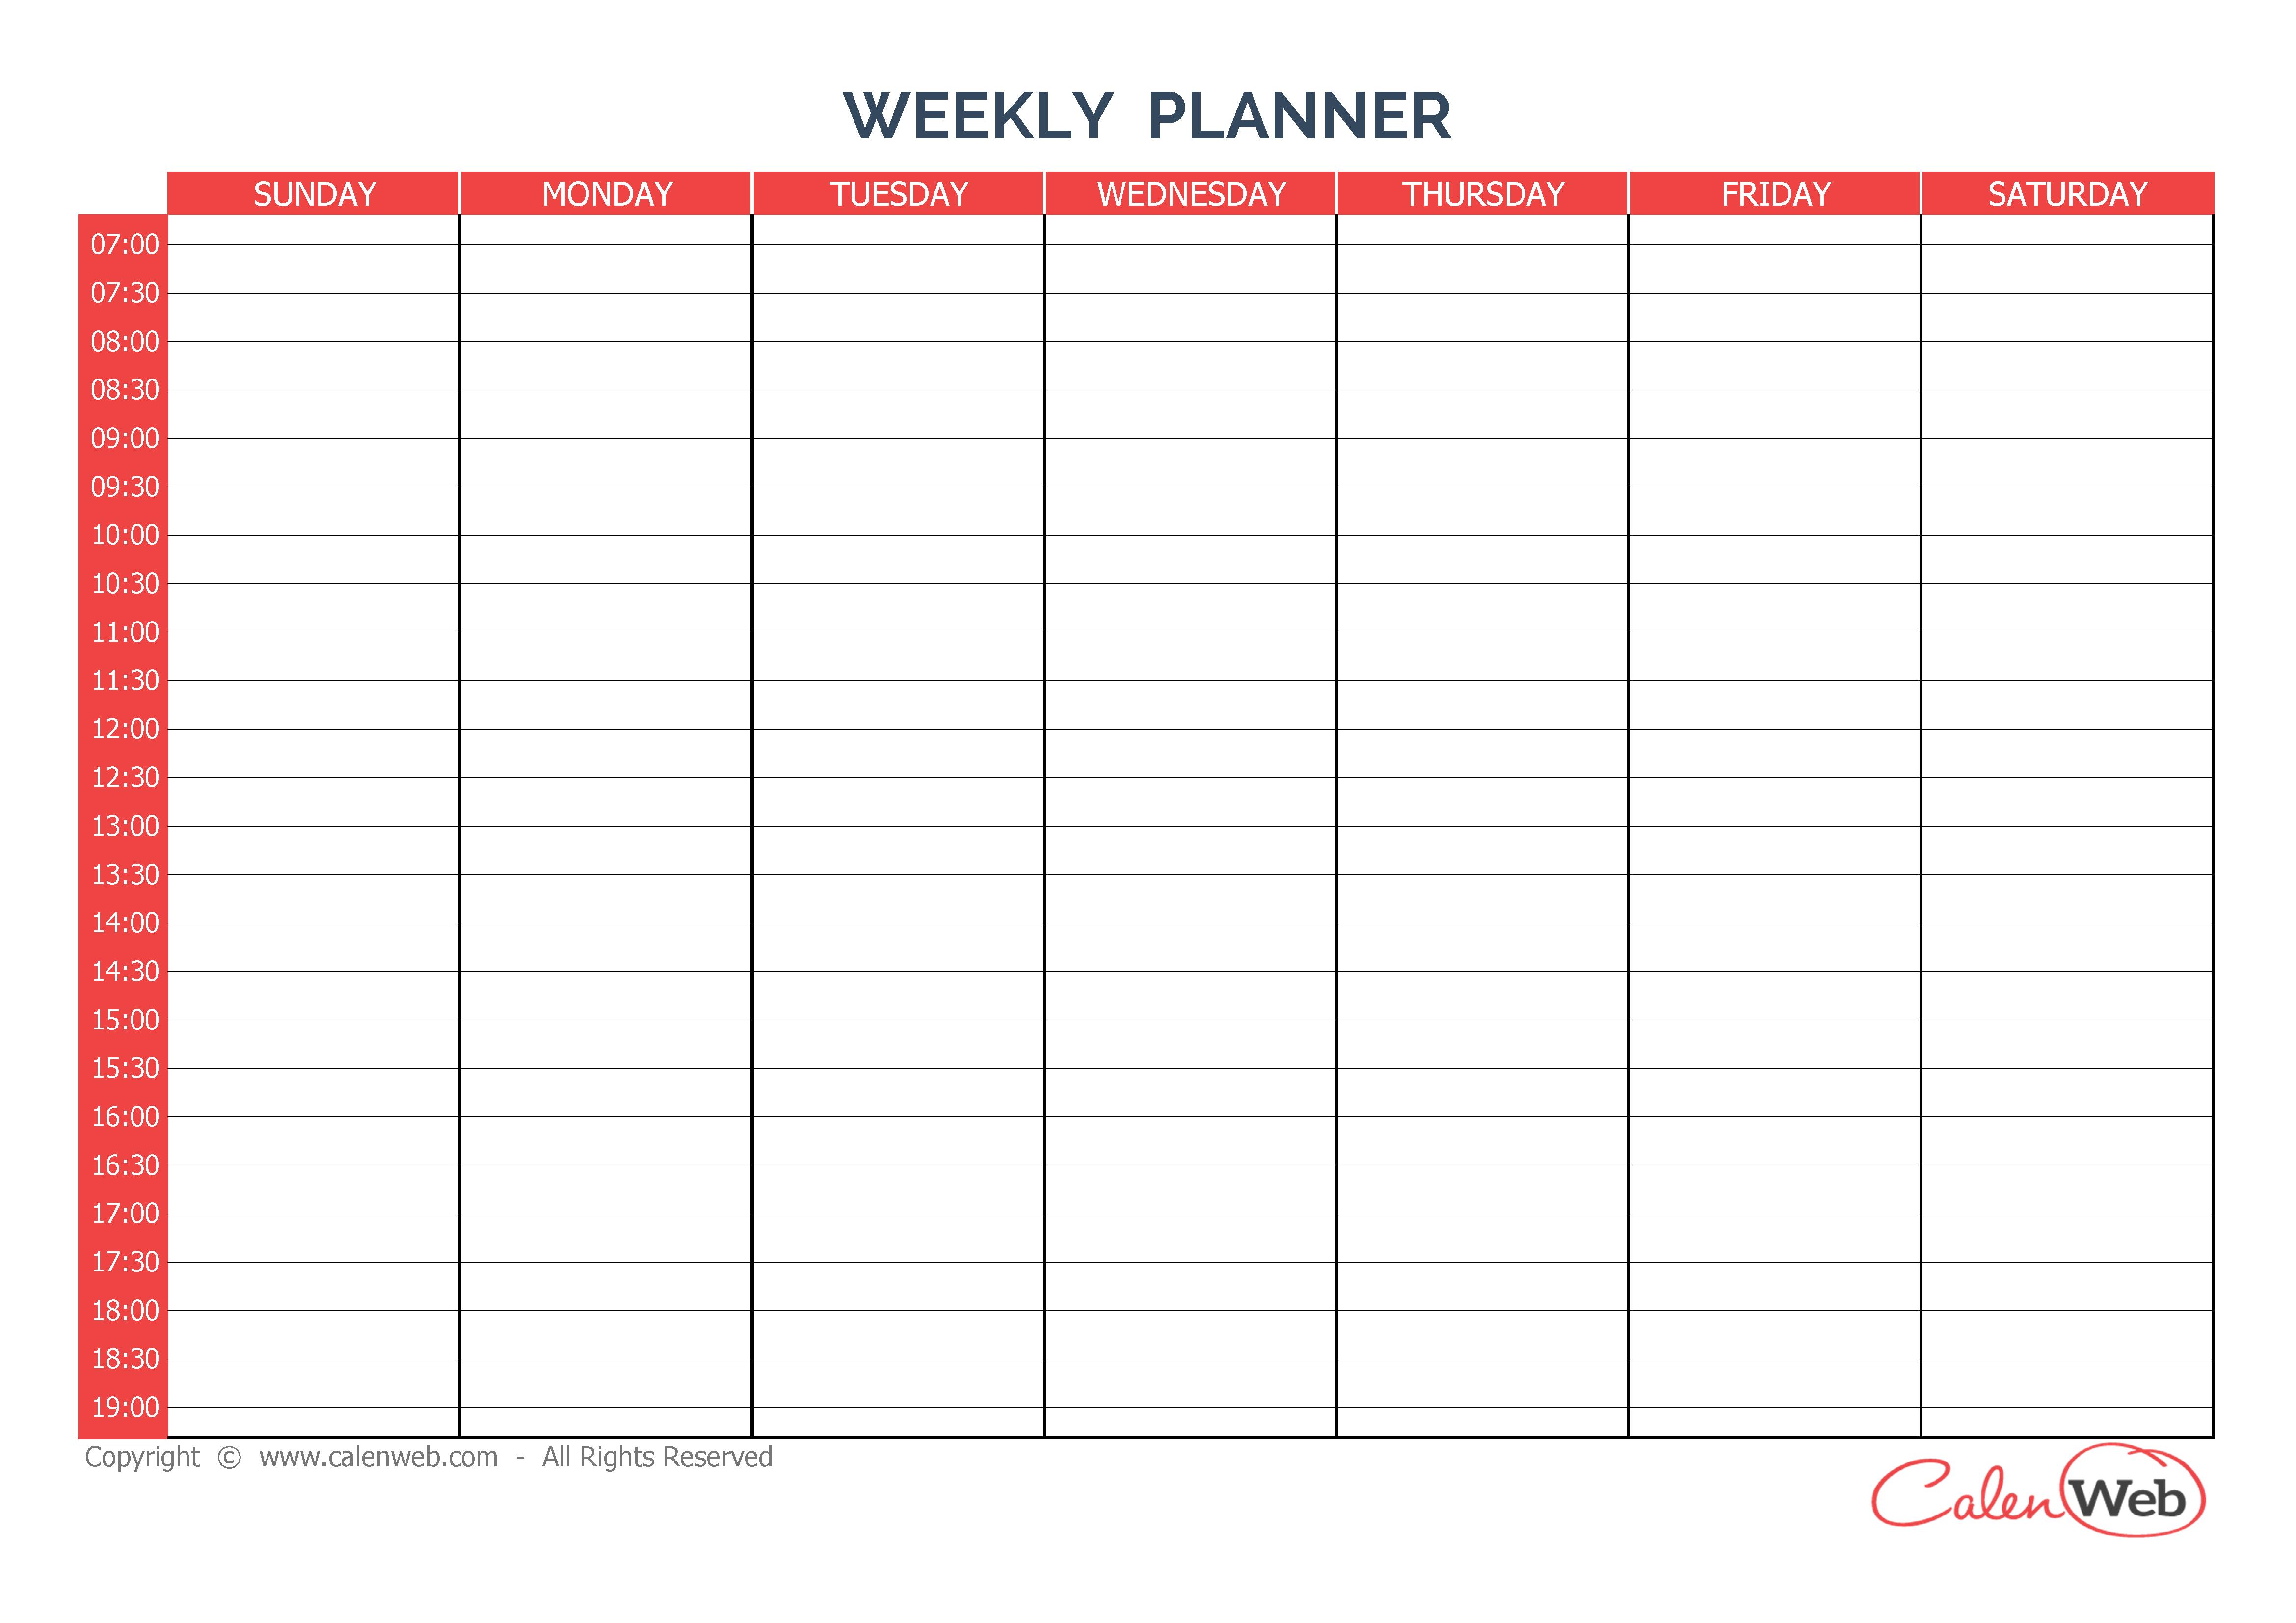 Calendriers Hebdomadaires – Calenweb Saturday Through Friday Calendar